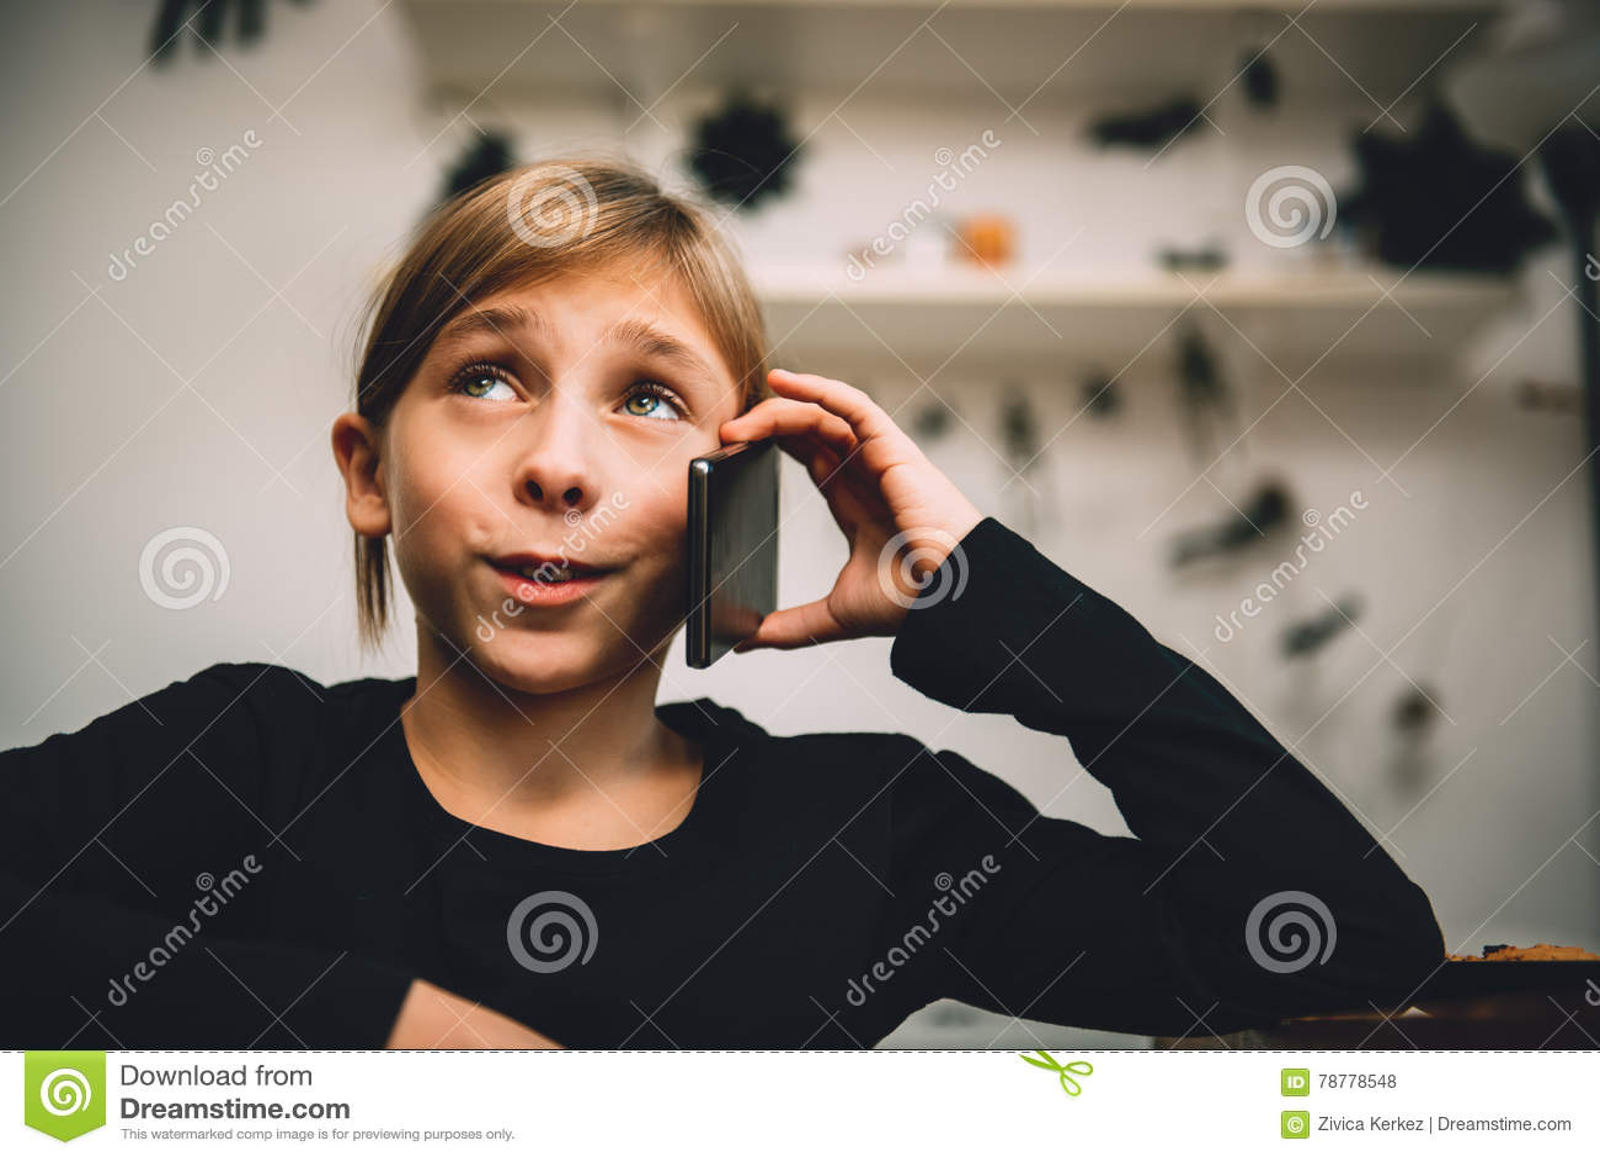 Little girl having a phone call